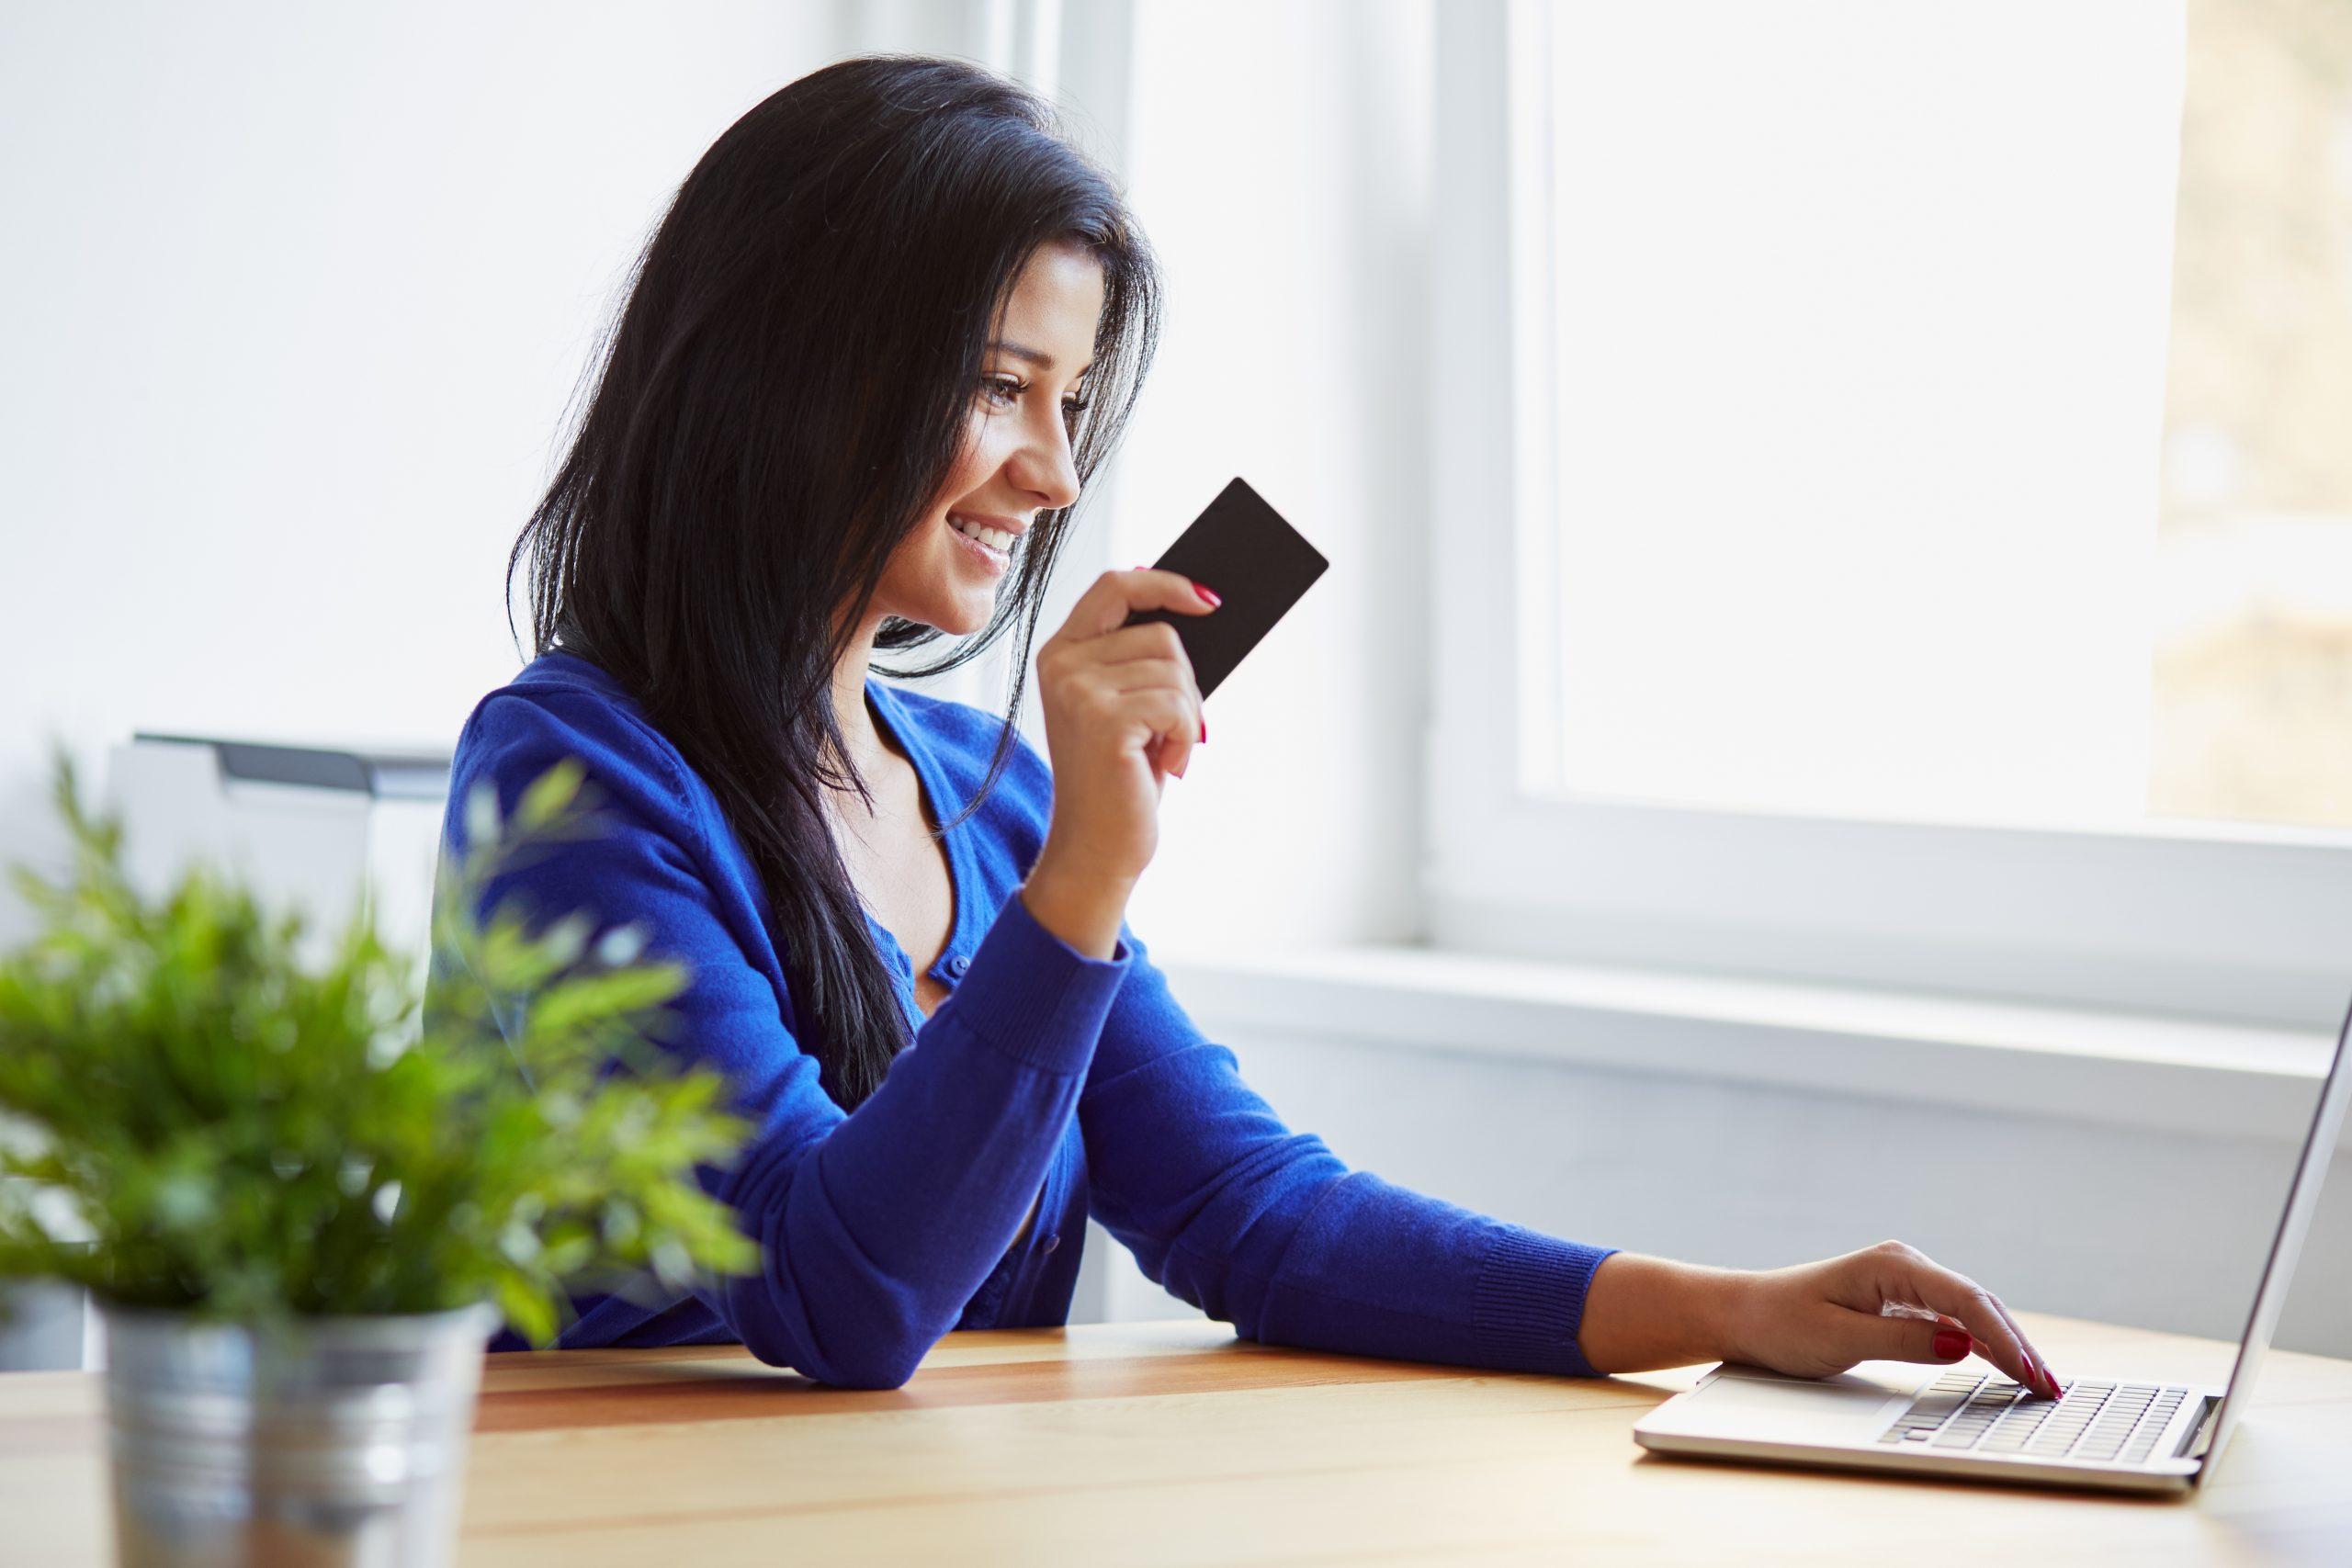 3 Clever Ways to Avoid Compulsive Spending